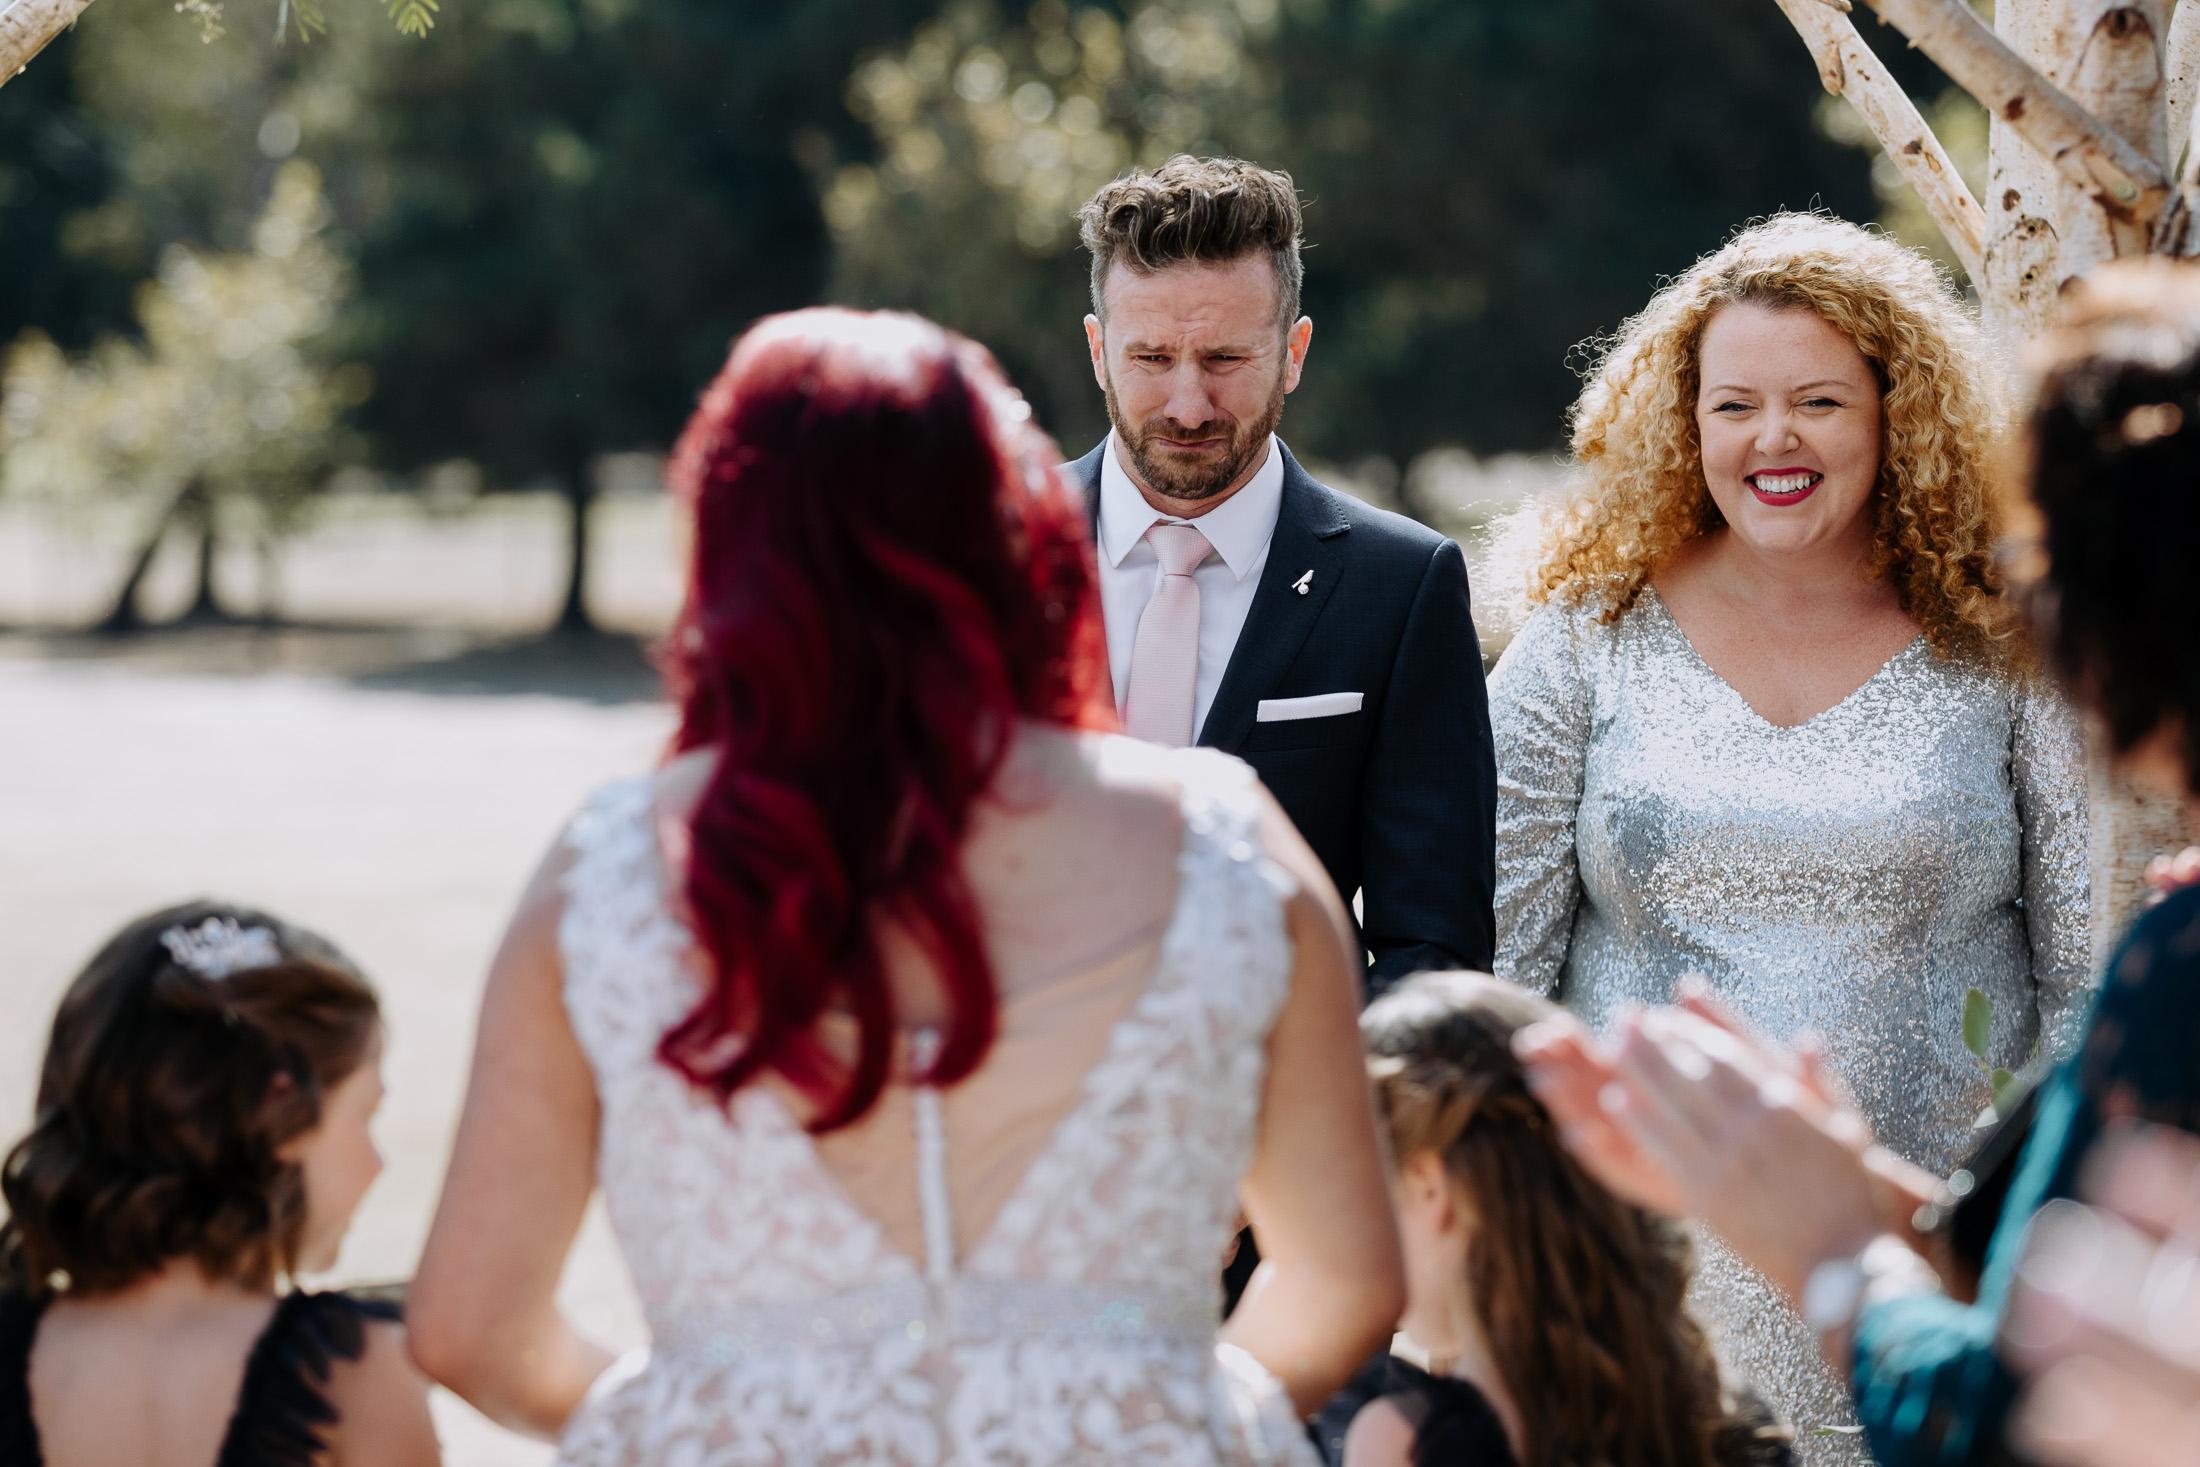 Anita-and-Tony-Greenfields-Wedding-Previews-0028.jpg